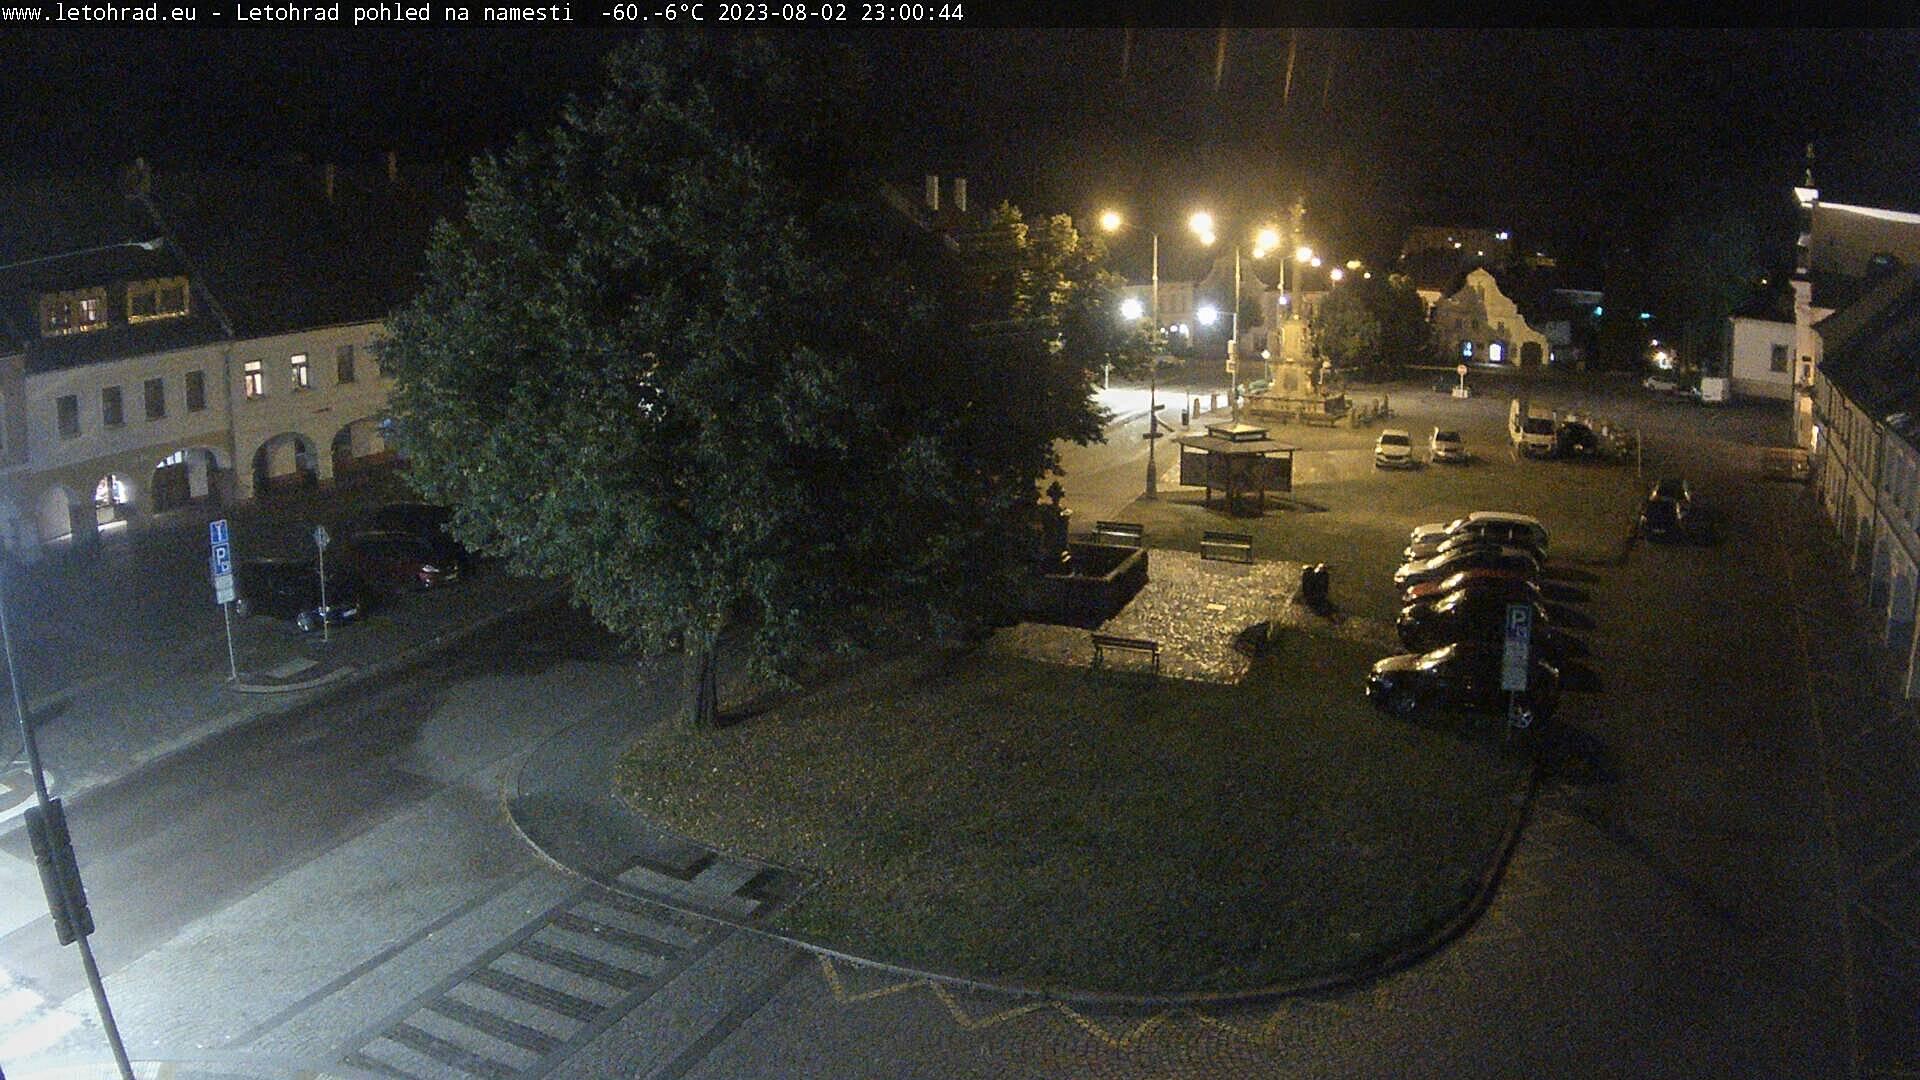 Webcam - Letohrad